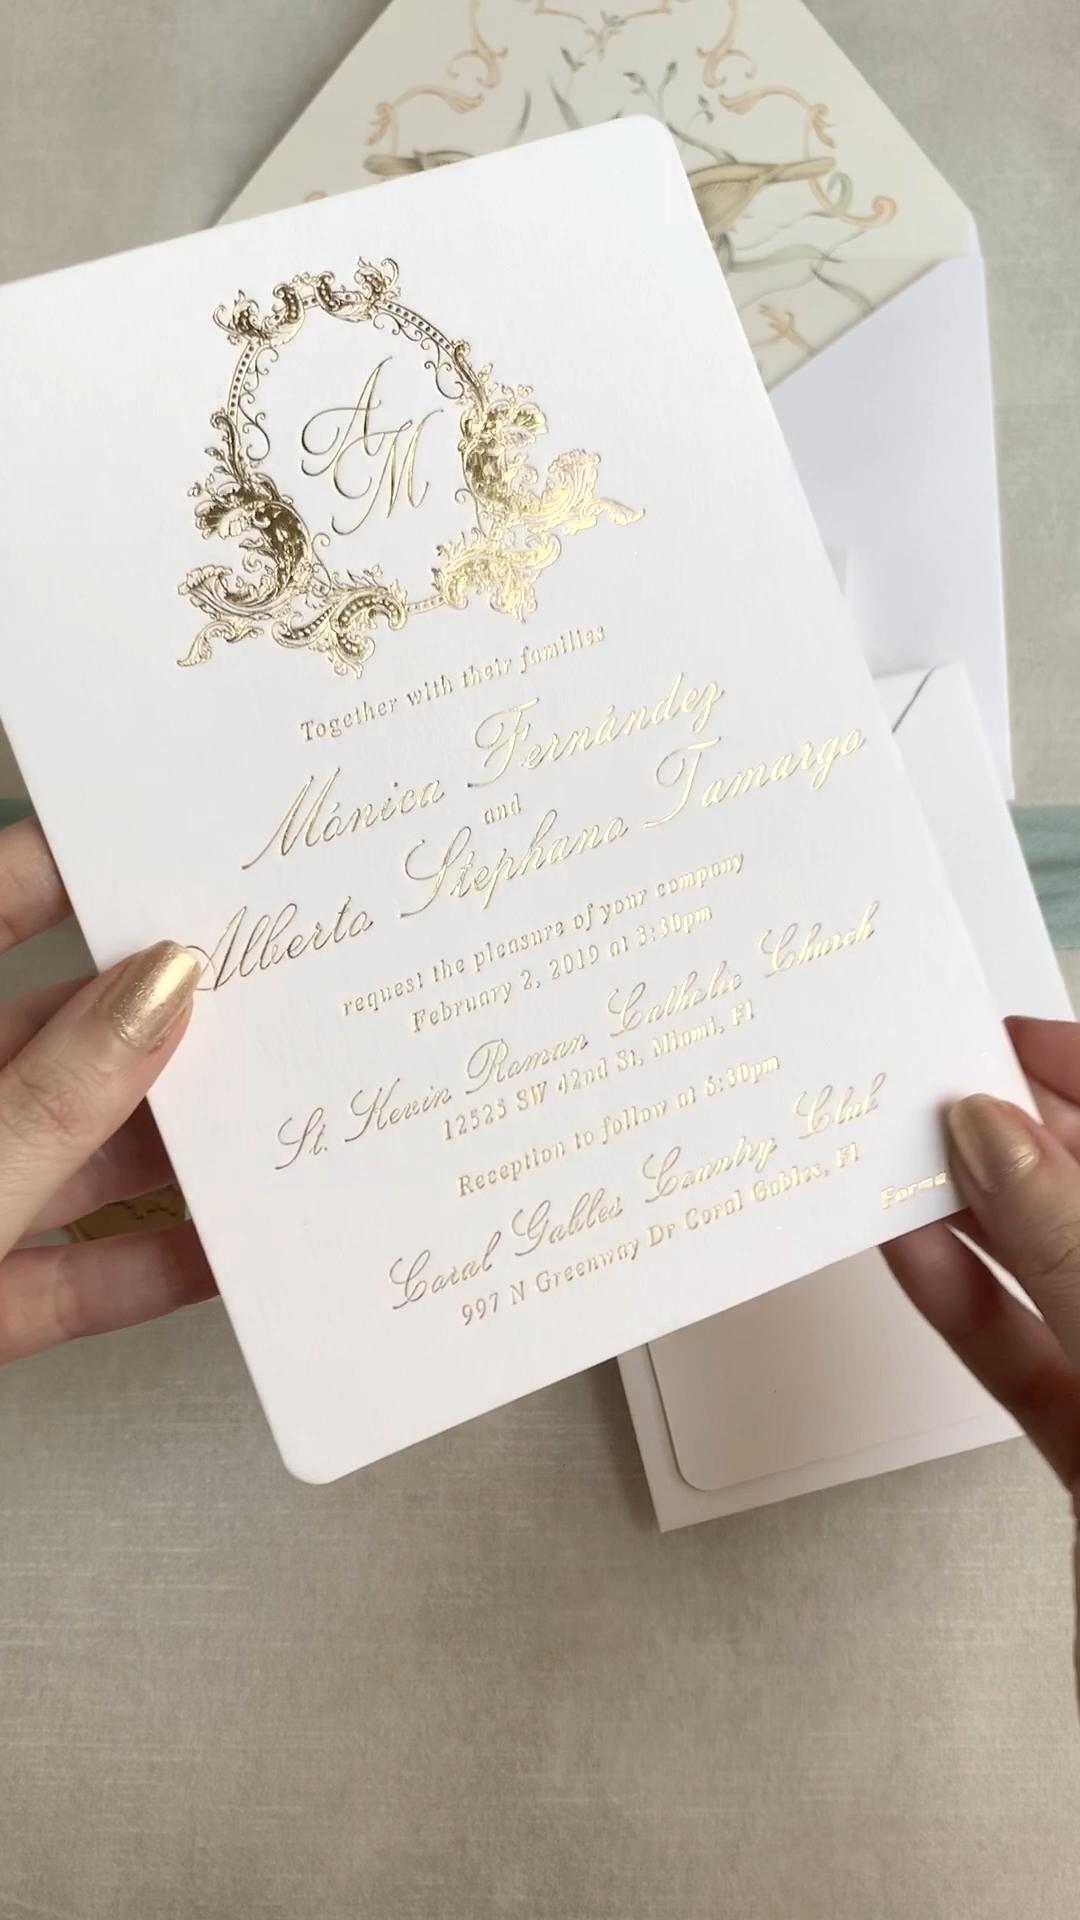 Wedding Hairstyles Wedding Invitation Design Floral Wedding Invitation Design In 2020 Wedding Invitation Cards Royal Wedding Invitation Vintage Wedding Invitations